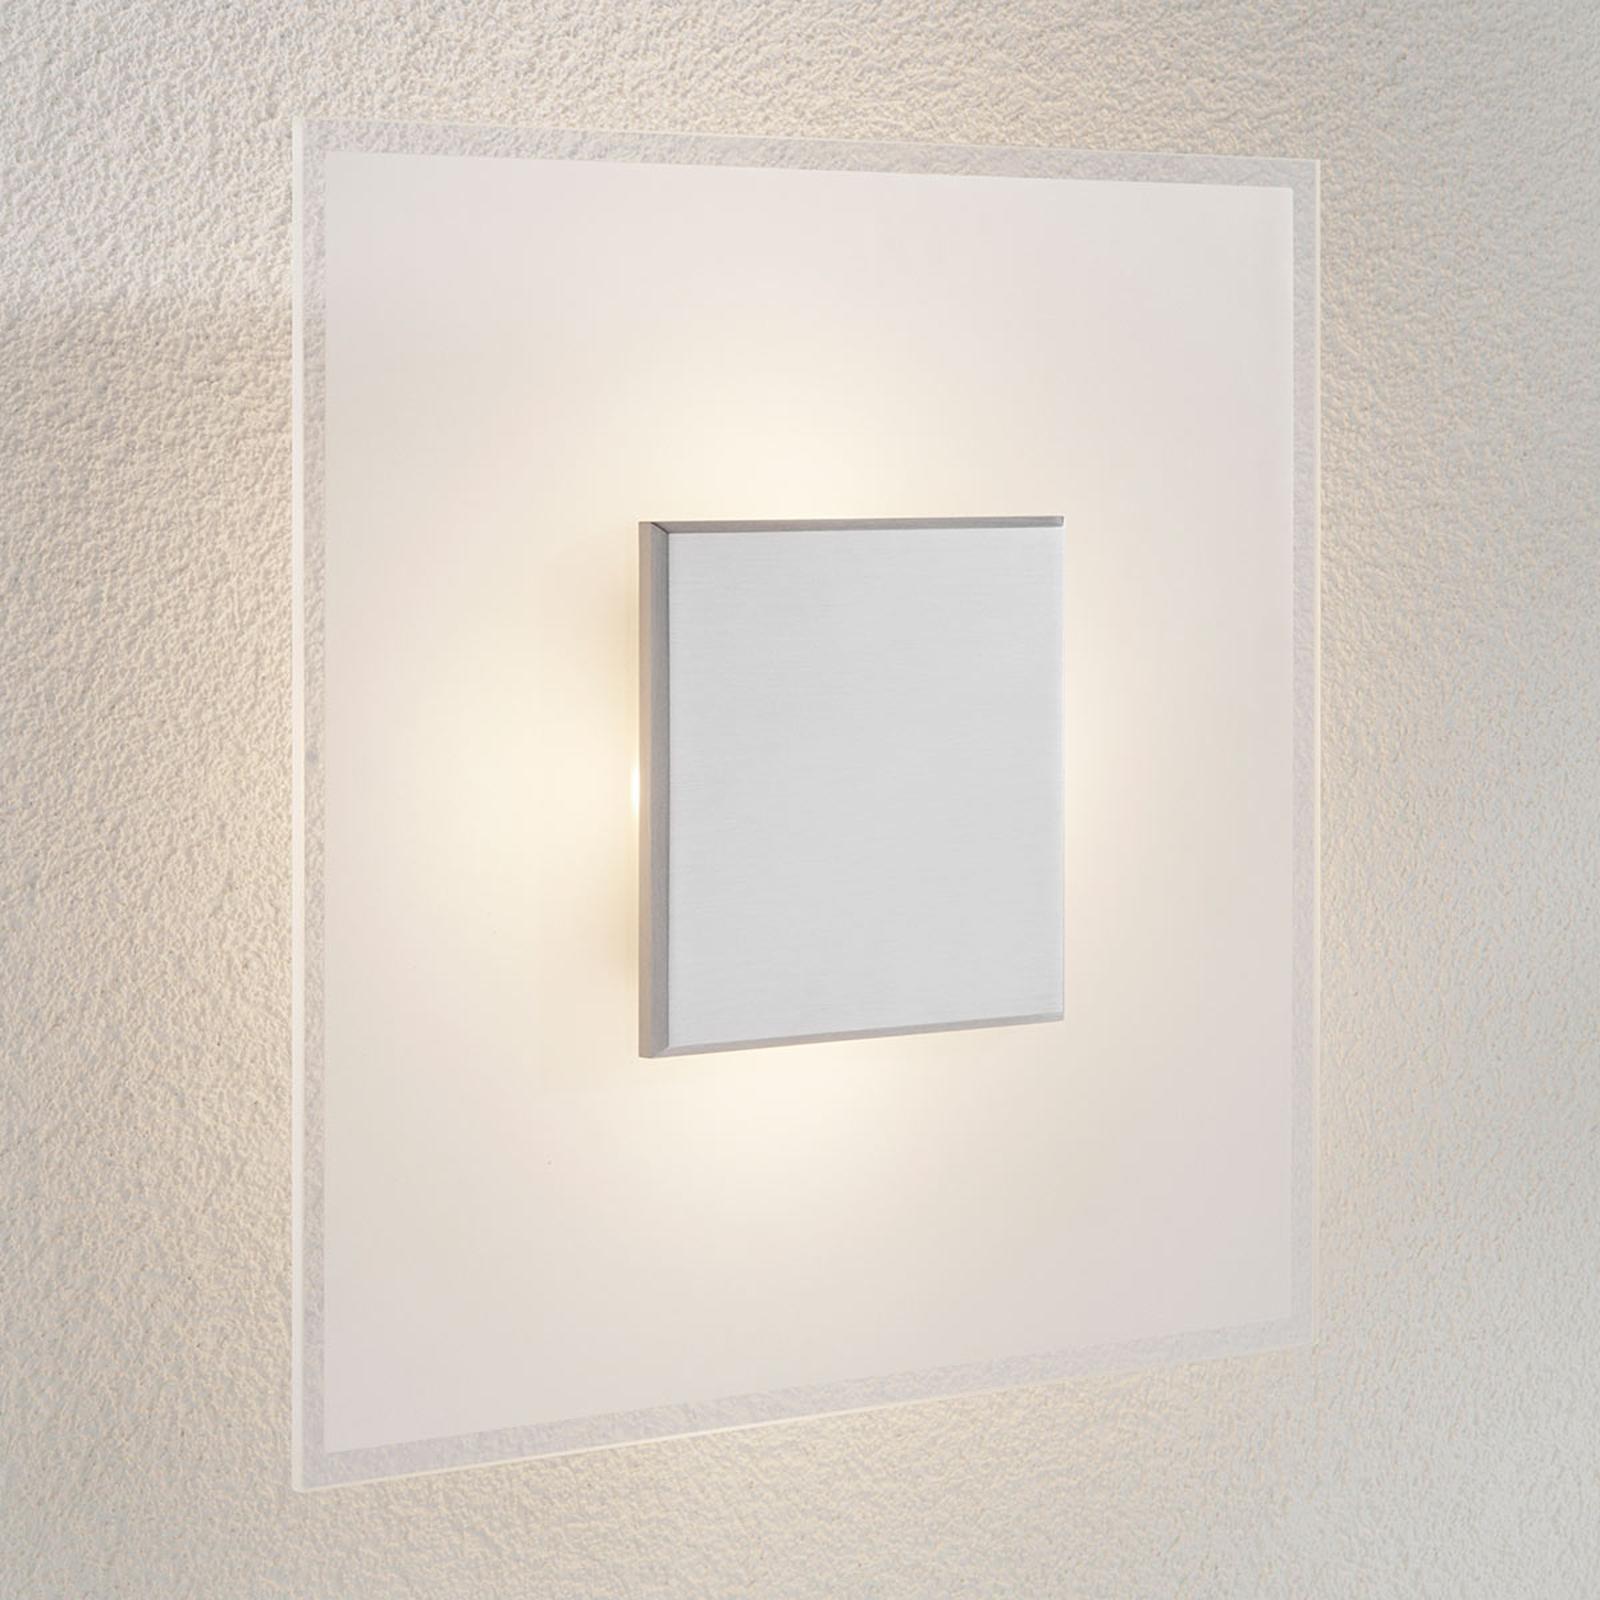 Dimbare LED wandlamp Lole van glas